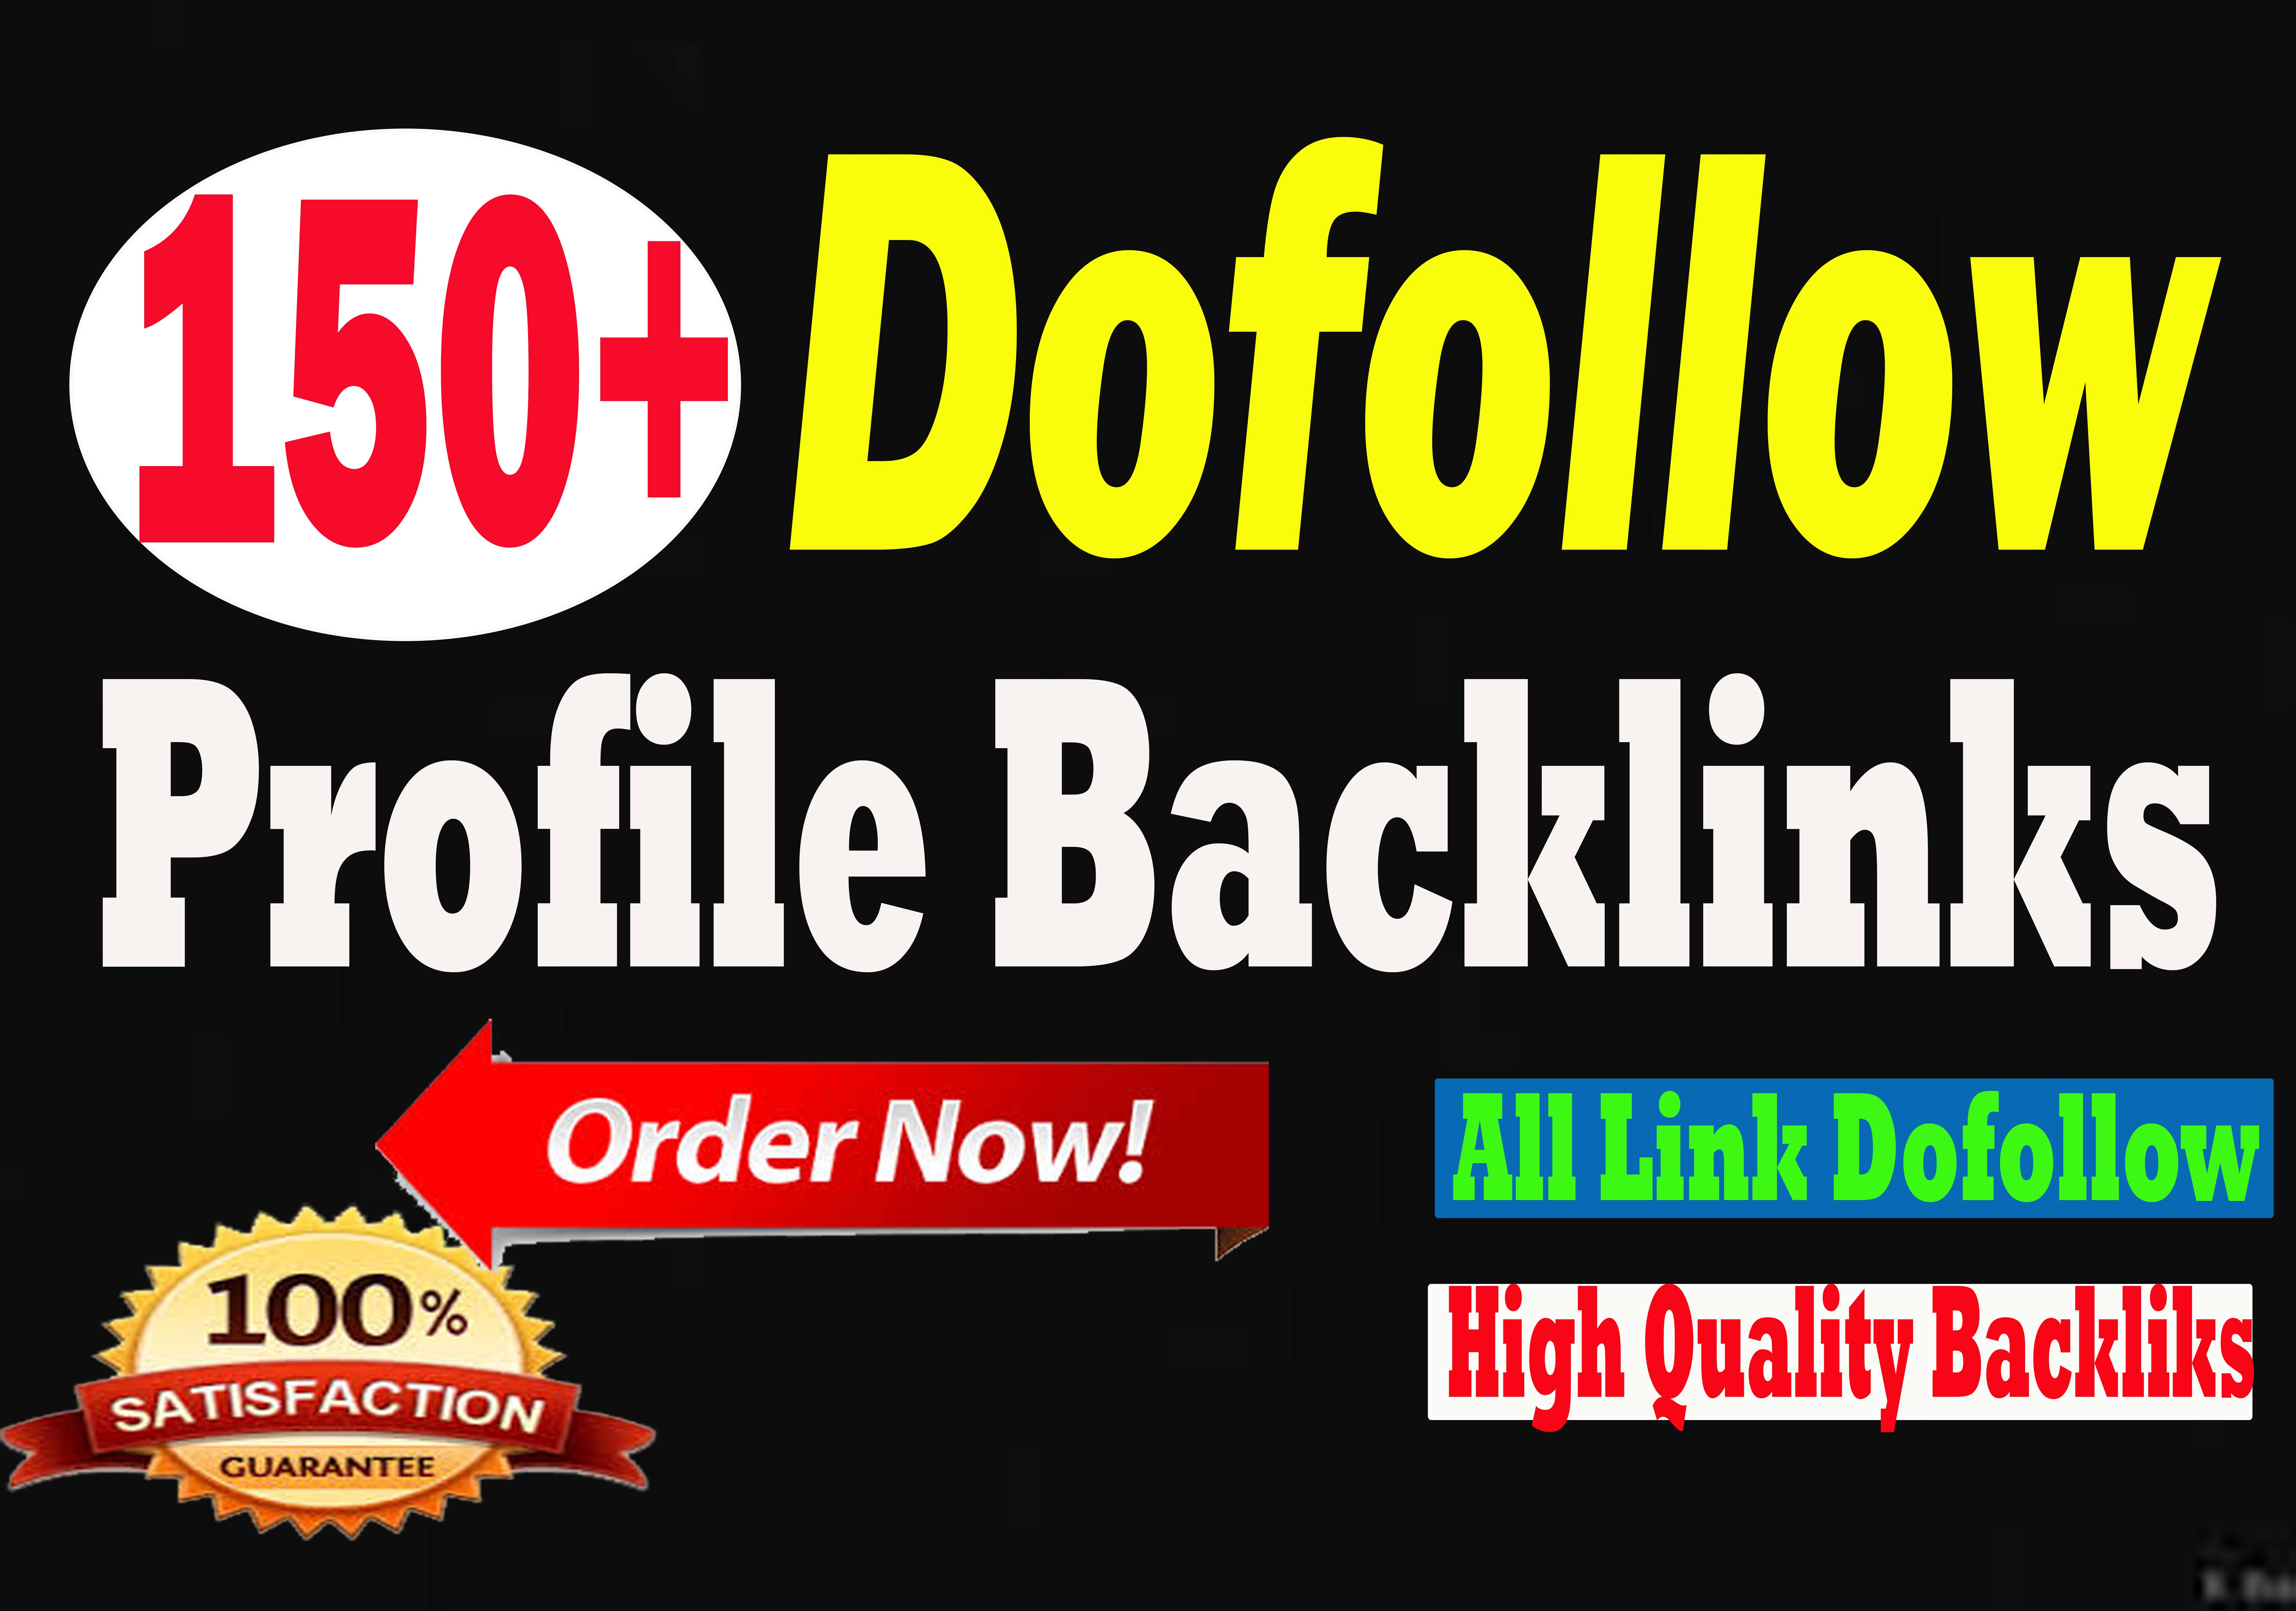 manually Create 150+ High DA90 best Quality Dofollow Profile Backlinks